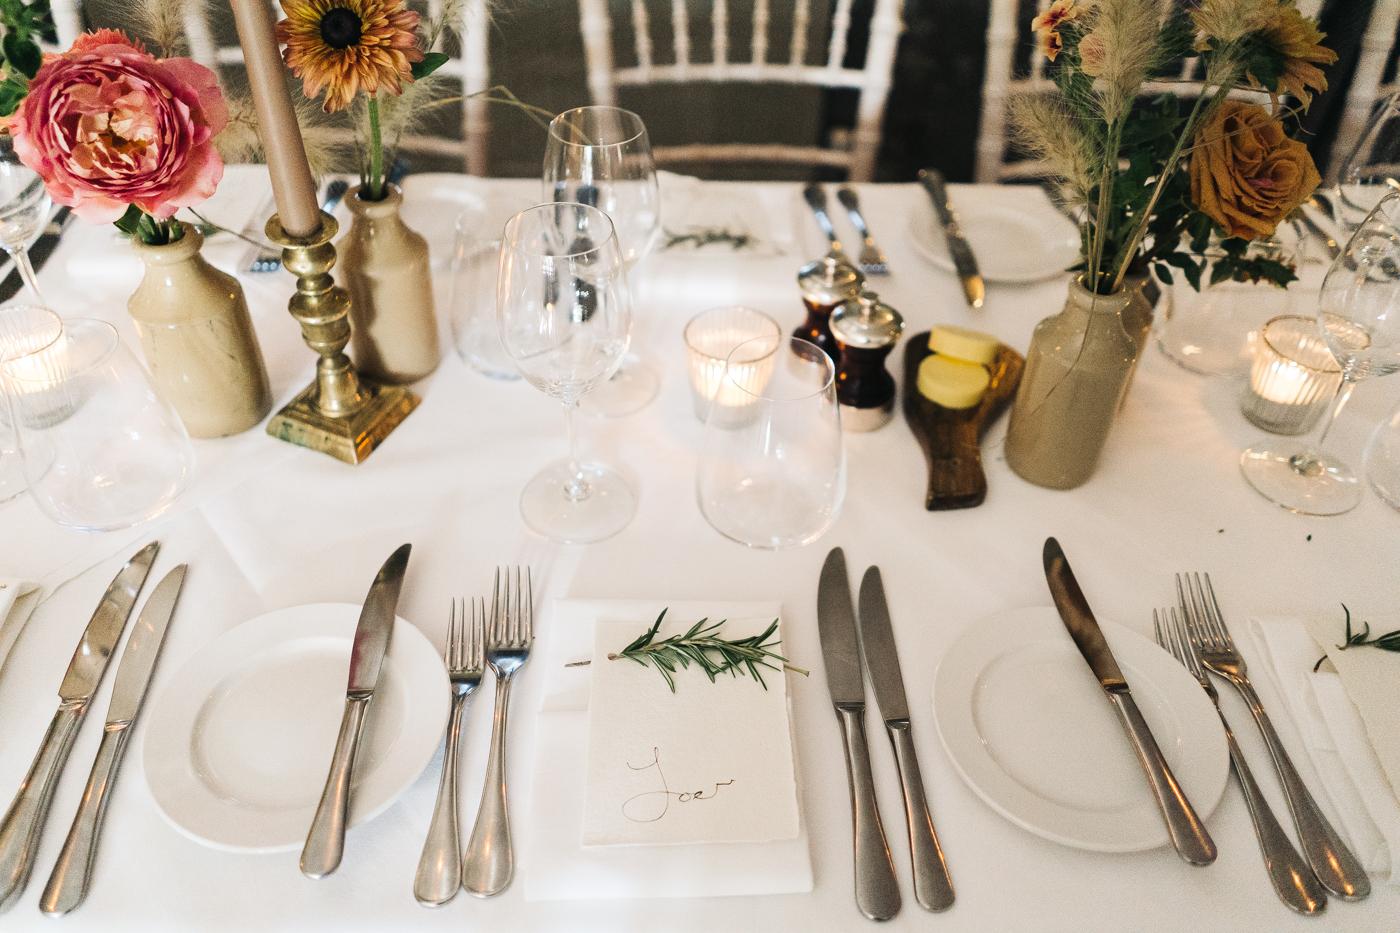 wedding-at-the-pheasant-harome-helmsley-north-yorkshire-wedding-photographer-0033.jpg